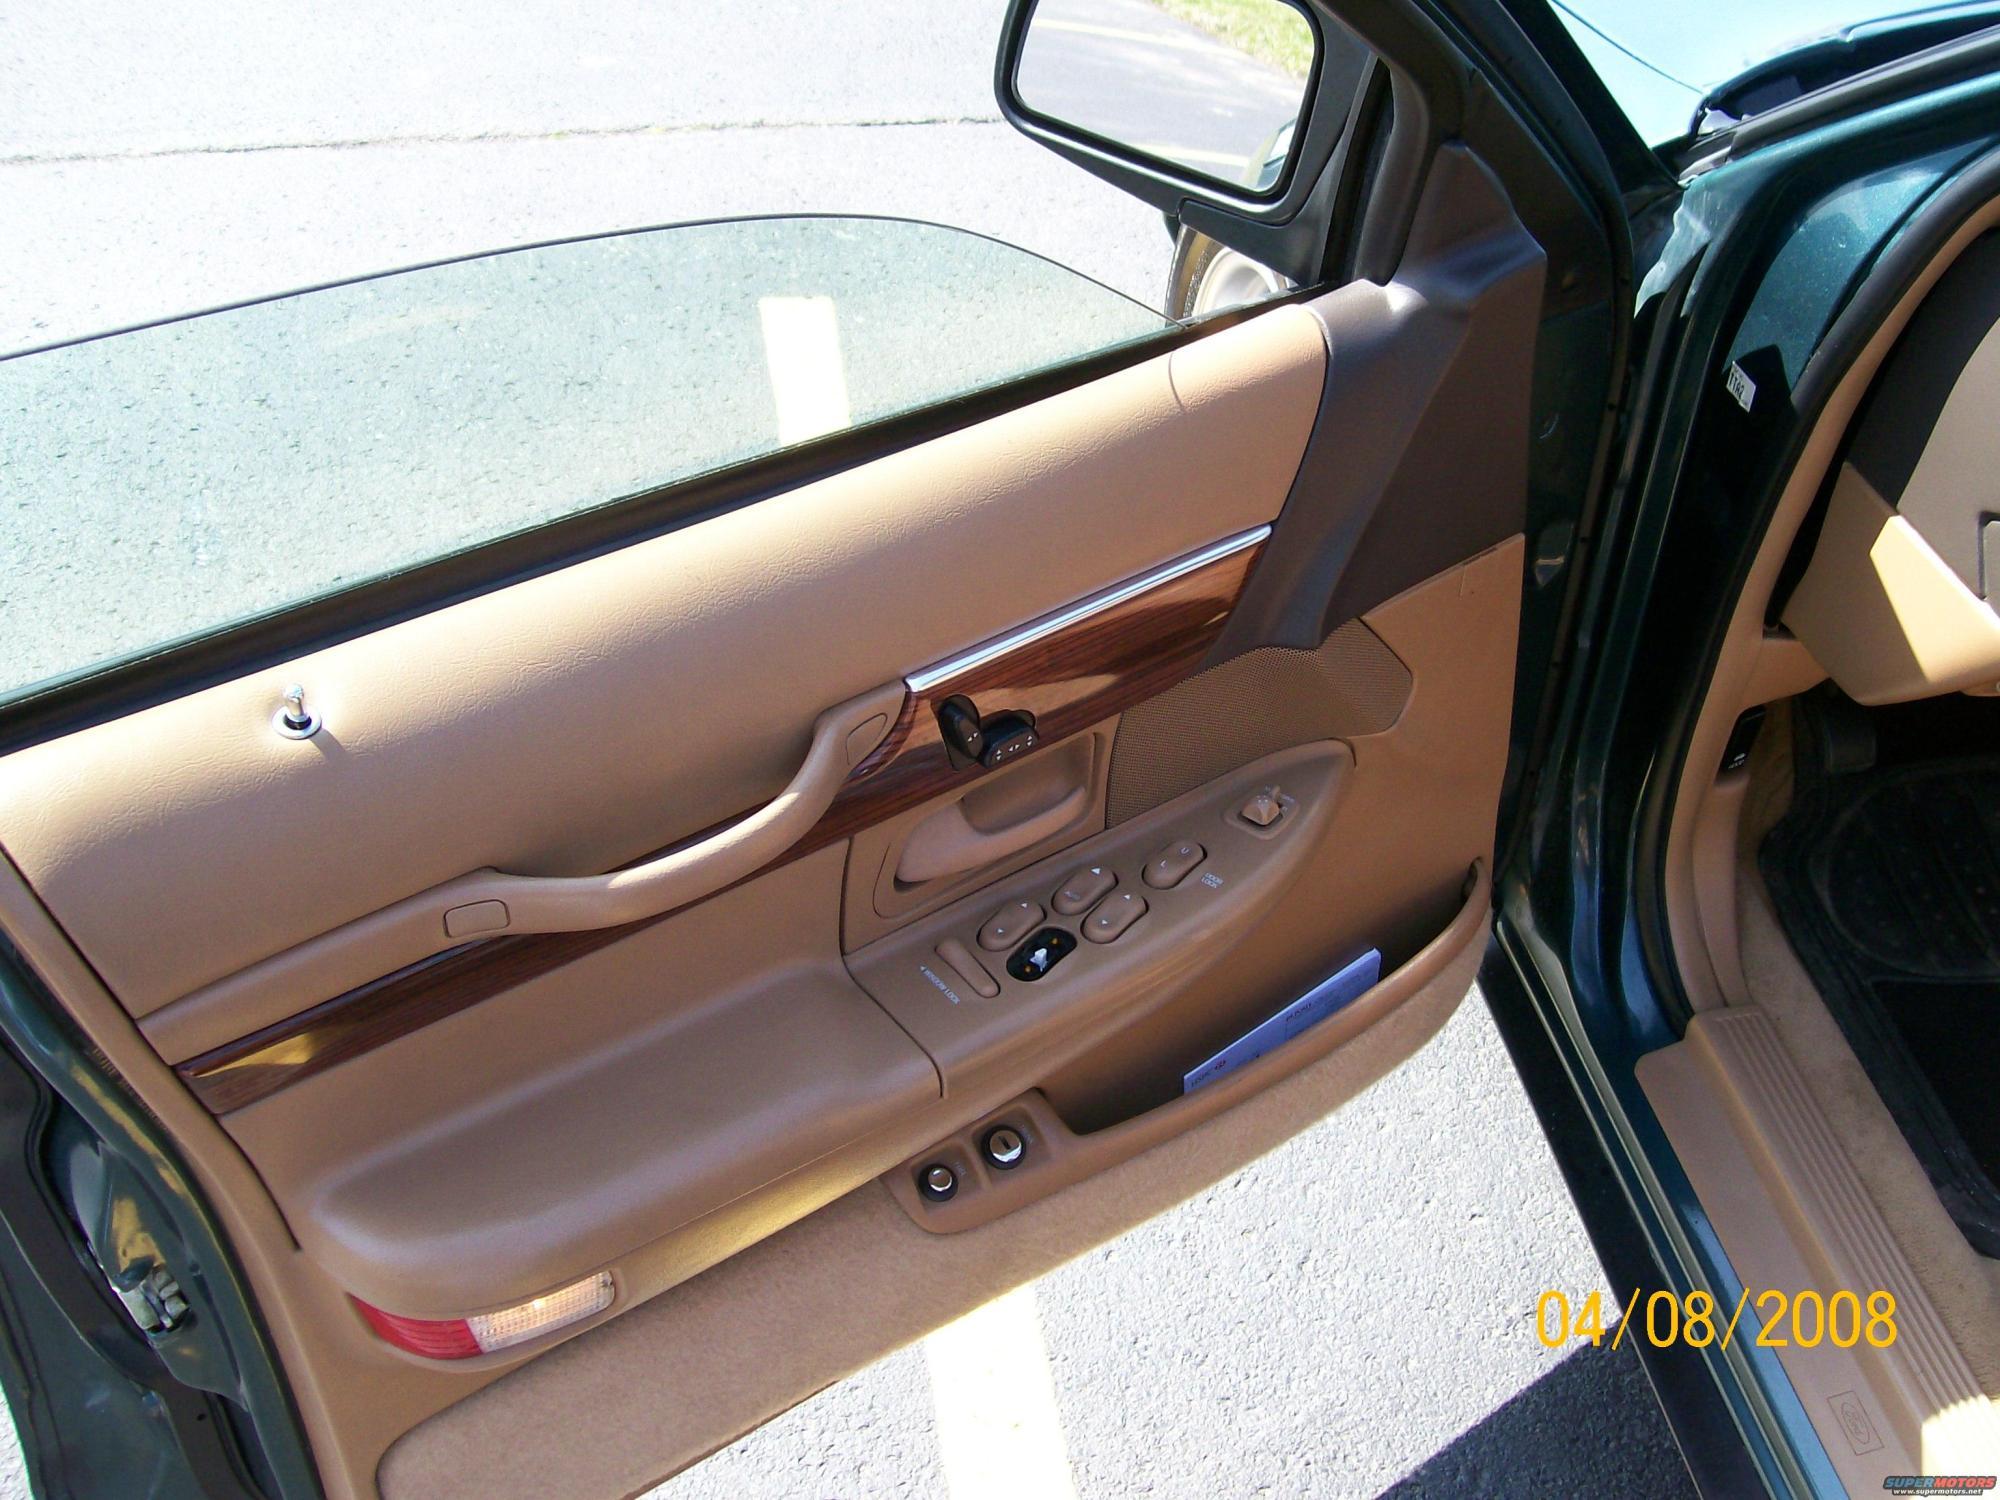 hight resolution of 1995 mercury grand marquis interior picture supermotors net 1985 mercury grand marquis interior 1999 mercury grand marquis interior